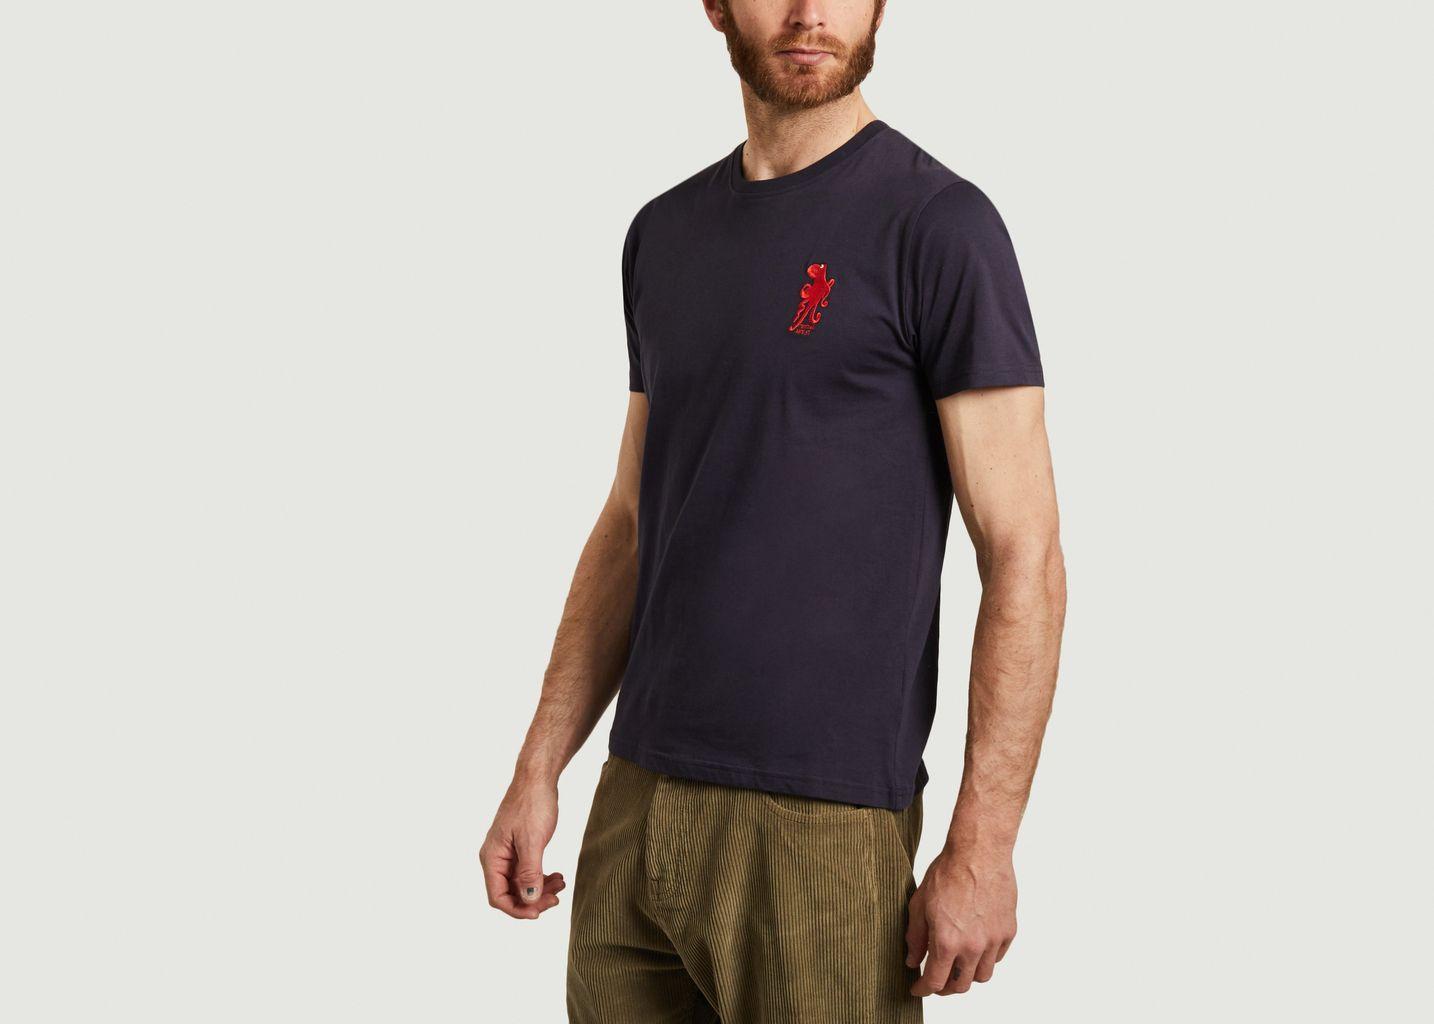 T-shirt en coton bio avec broderie Inktopus - Olow